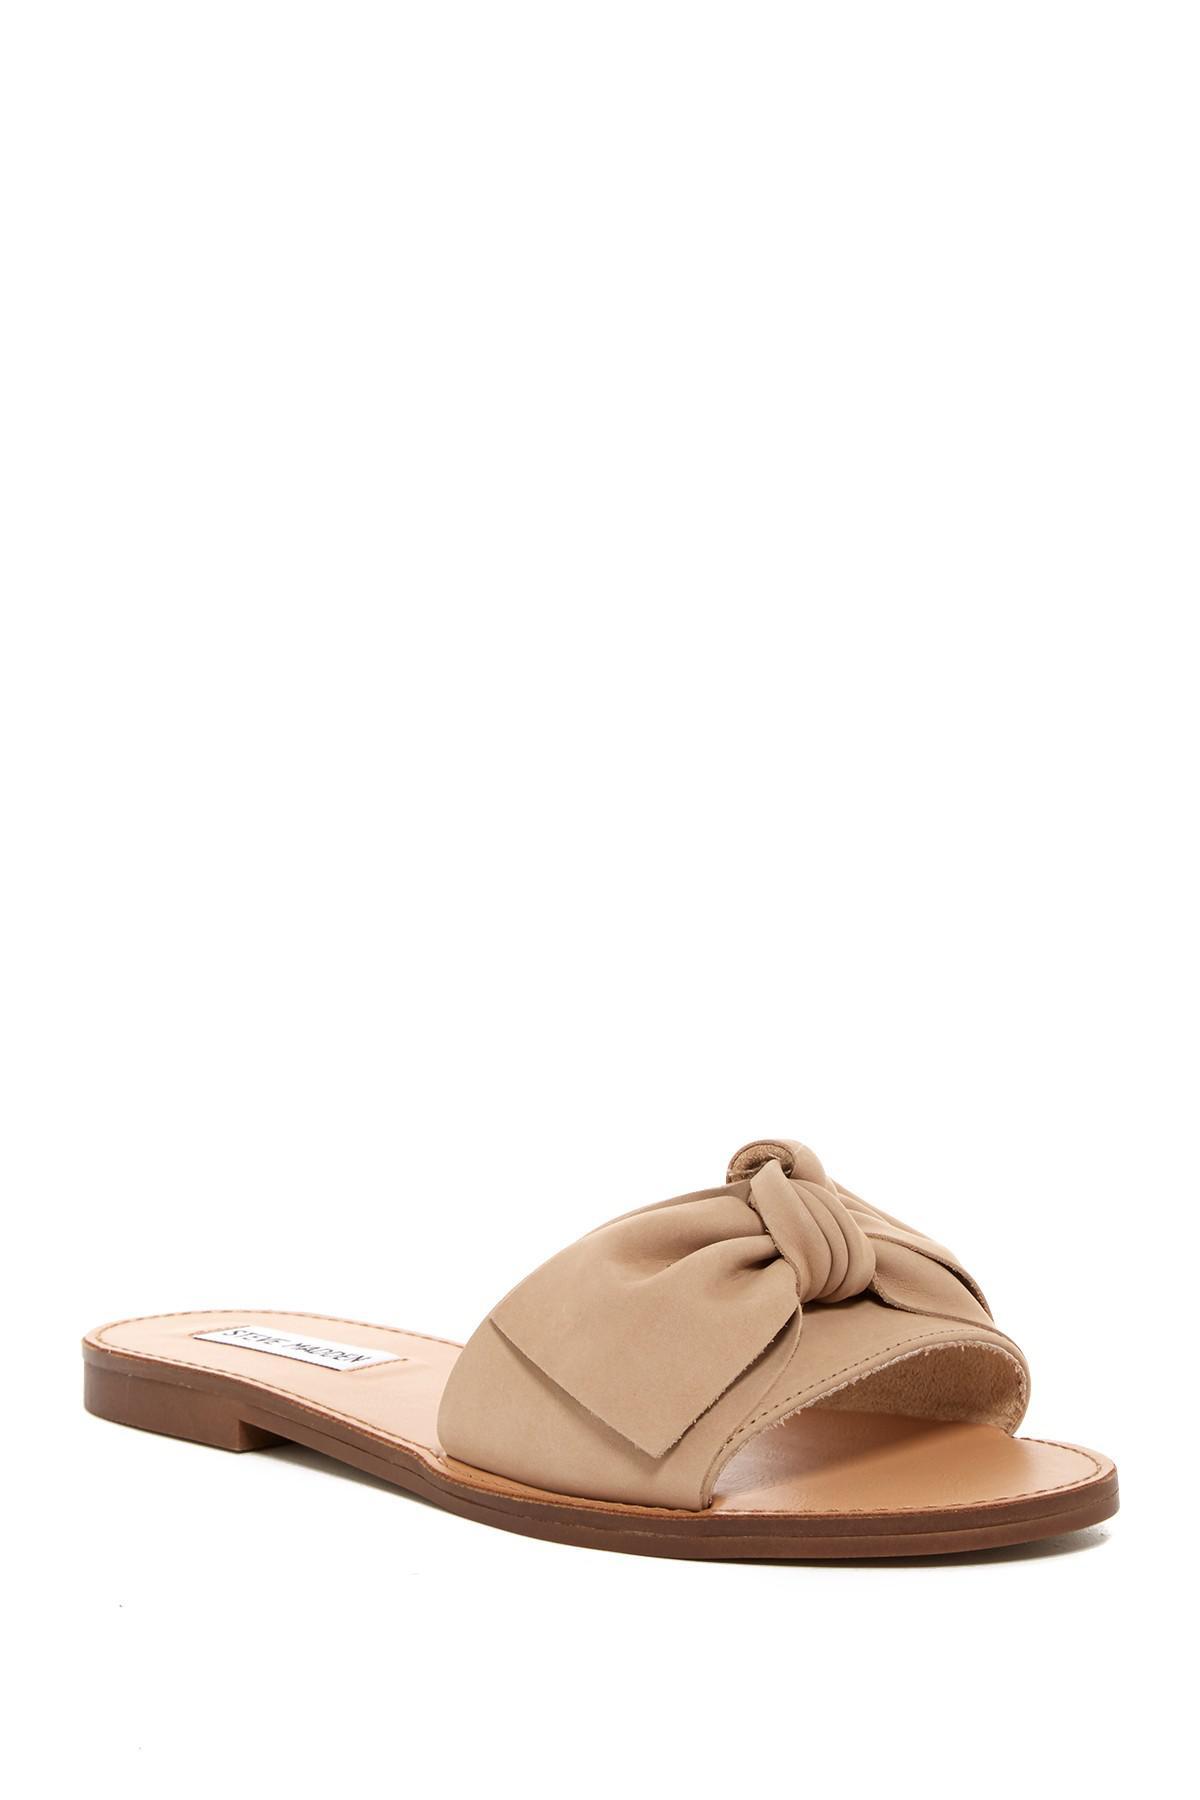 f3226ffe0928 Lyst - Steve Madden Diora Bow Slid Sandal in Natural